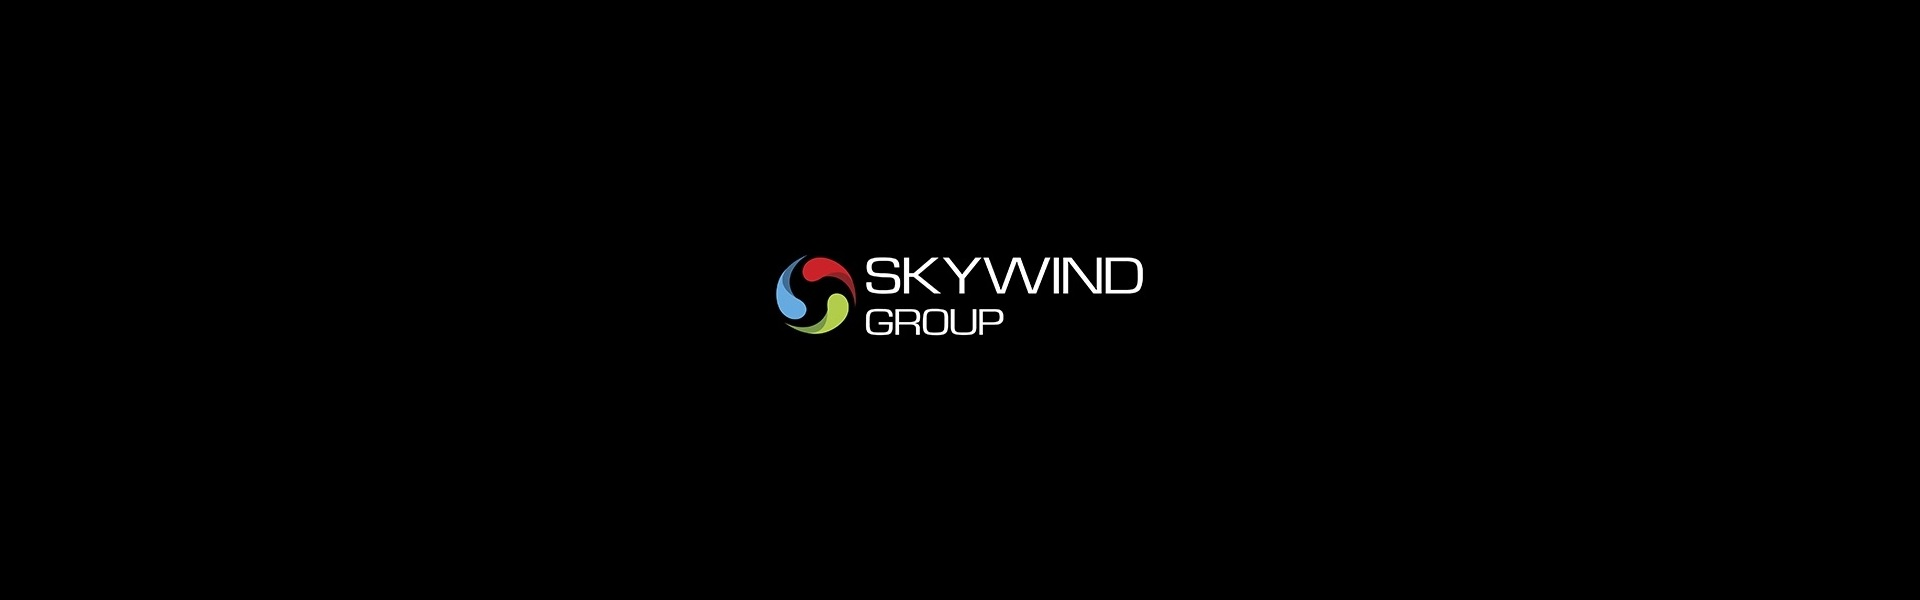 Skywind welcomes Casino Gran Madrid Online as newest partner